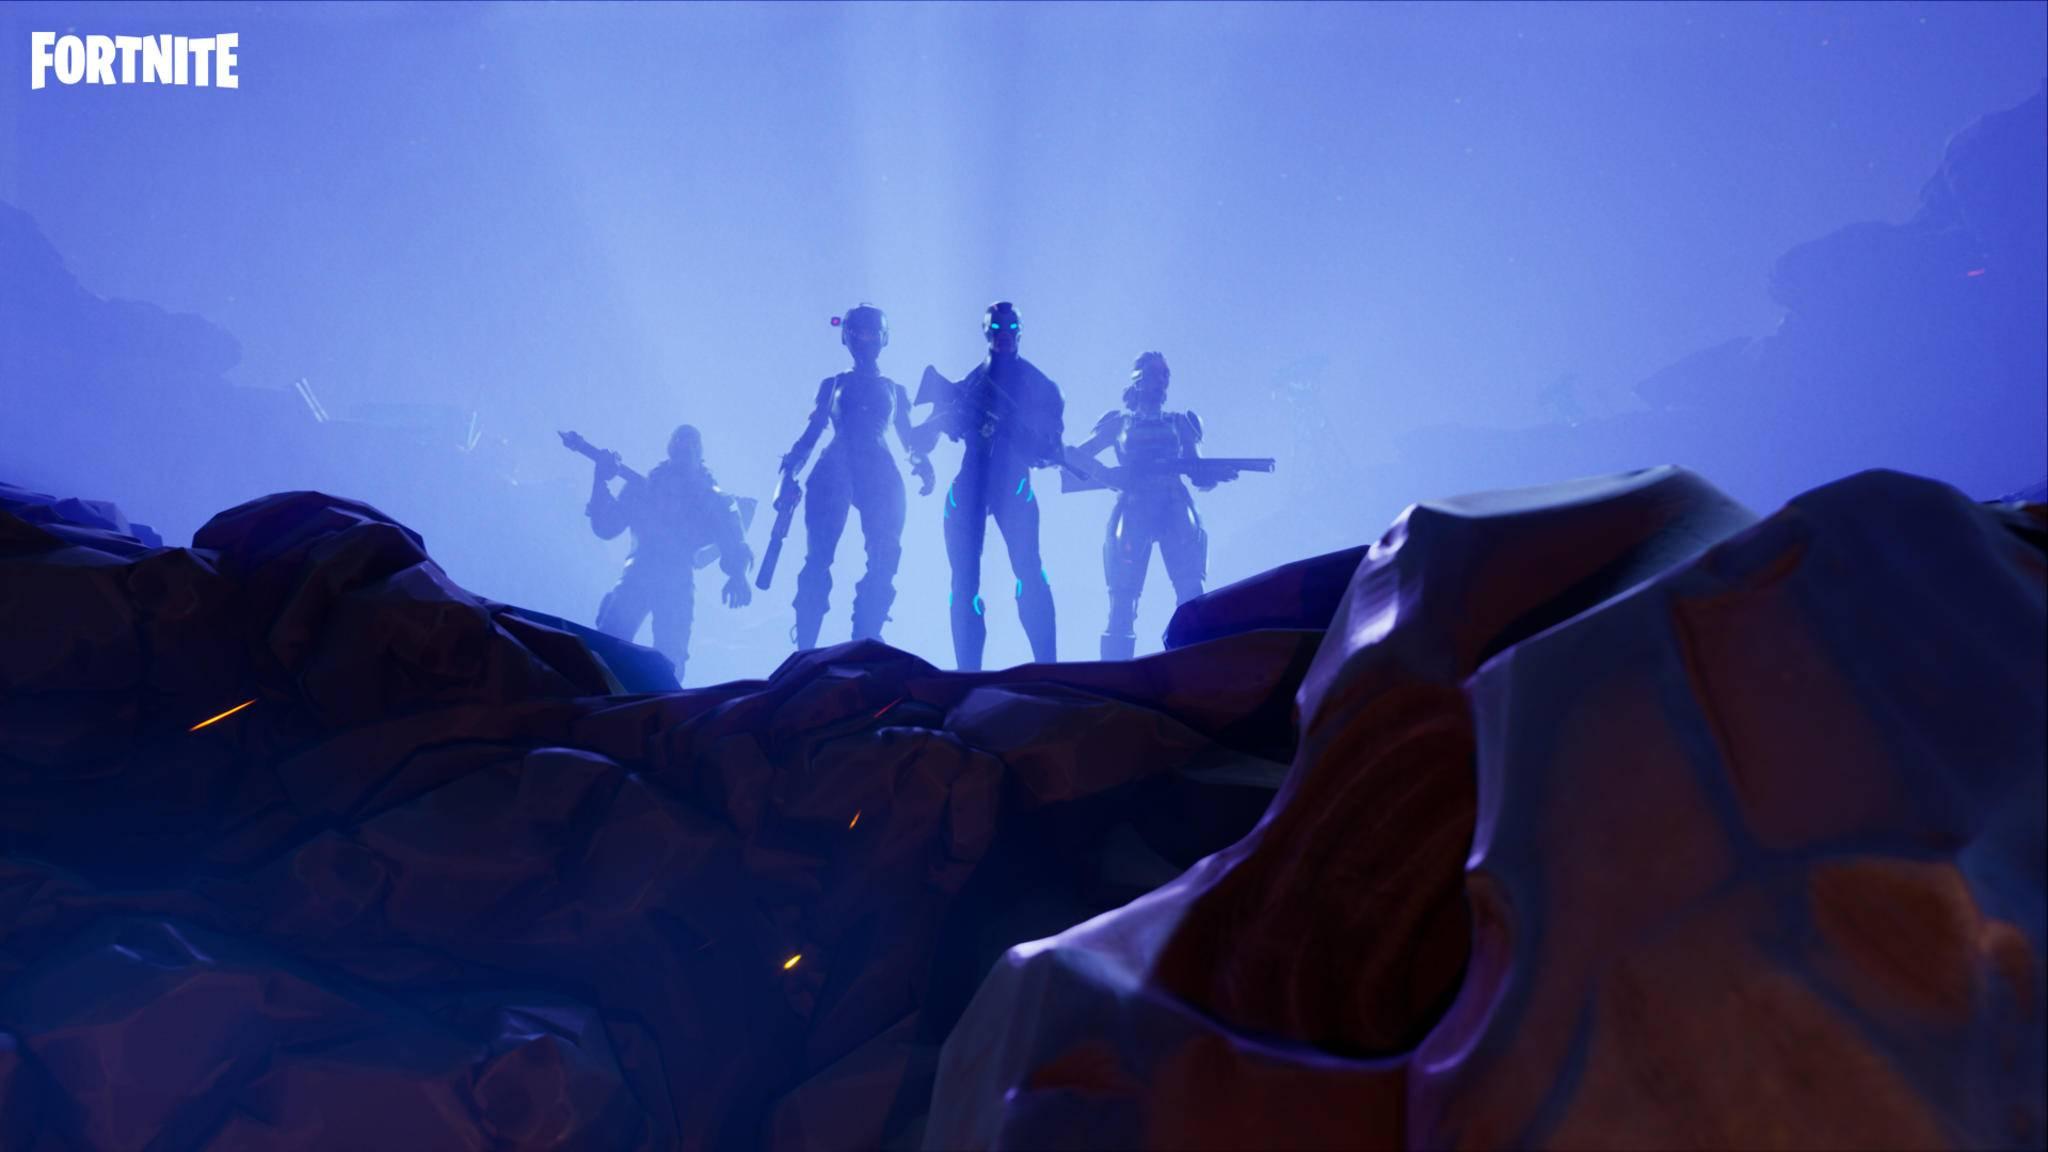 fortnite-battle-royale-season-4-krater